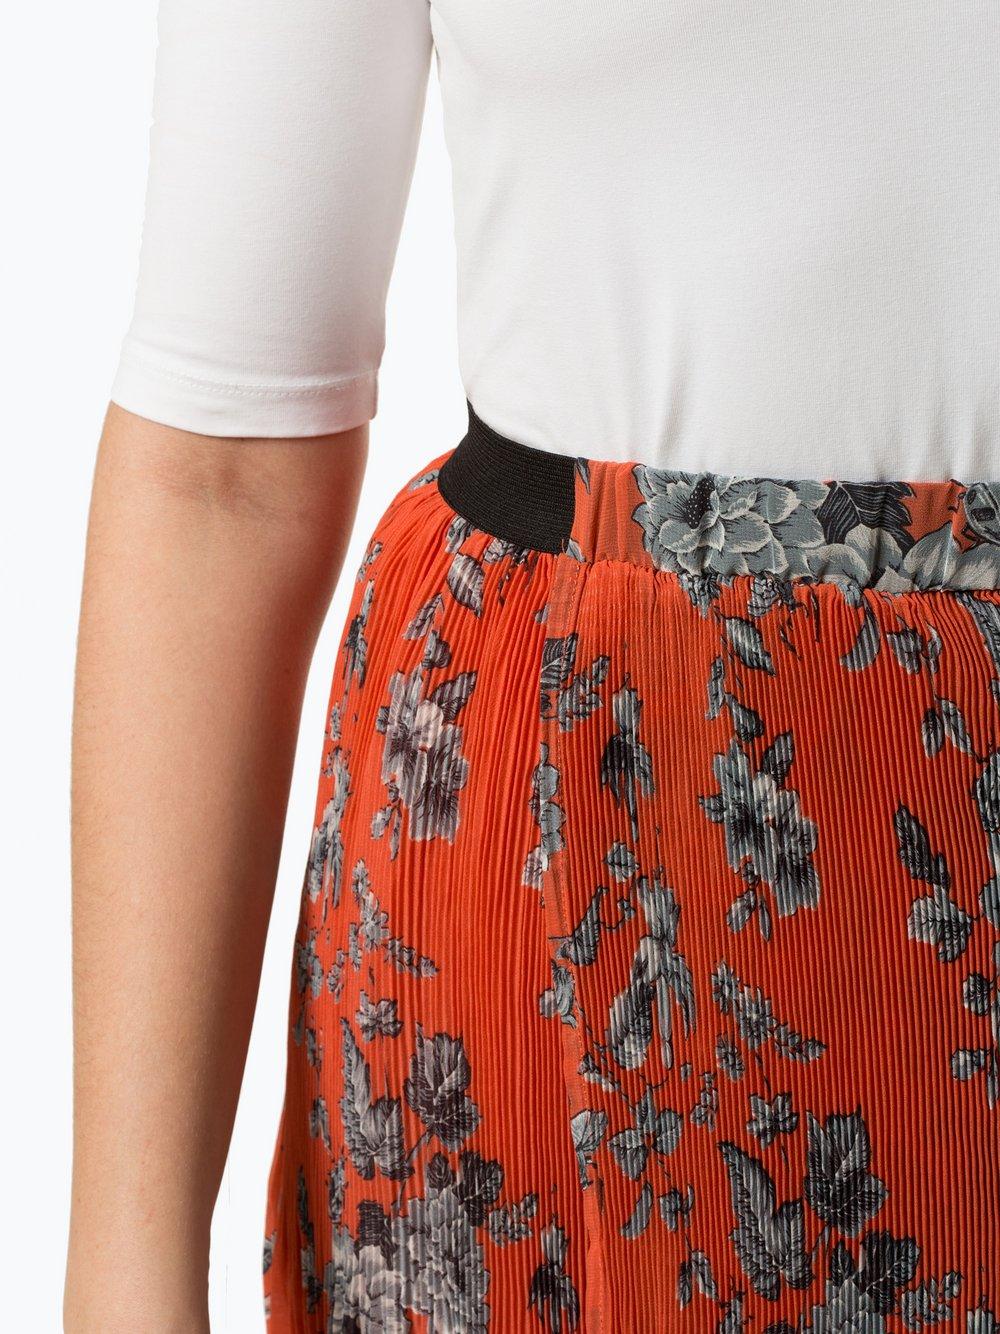 Pepe Jeans Damen Rock Cheline online kaufen | PEEK UND